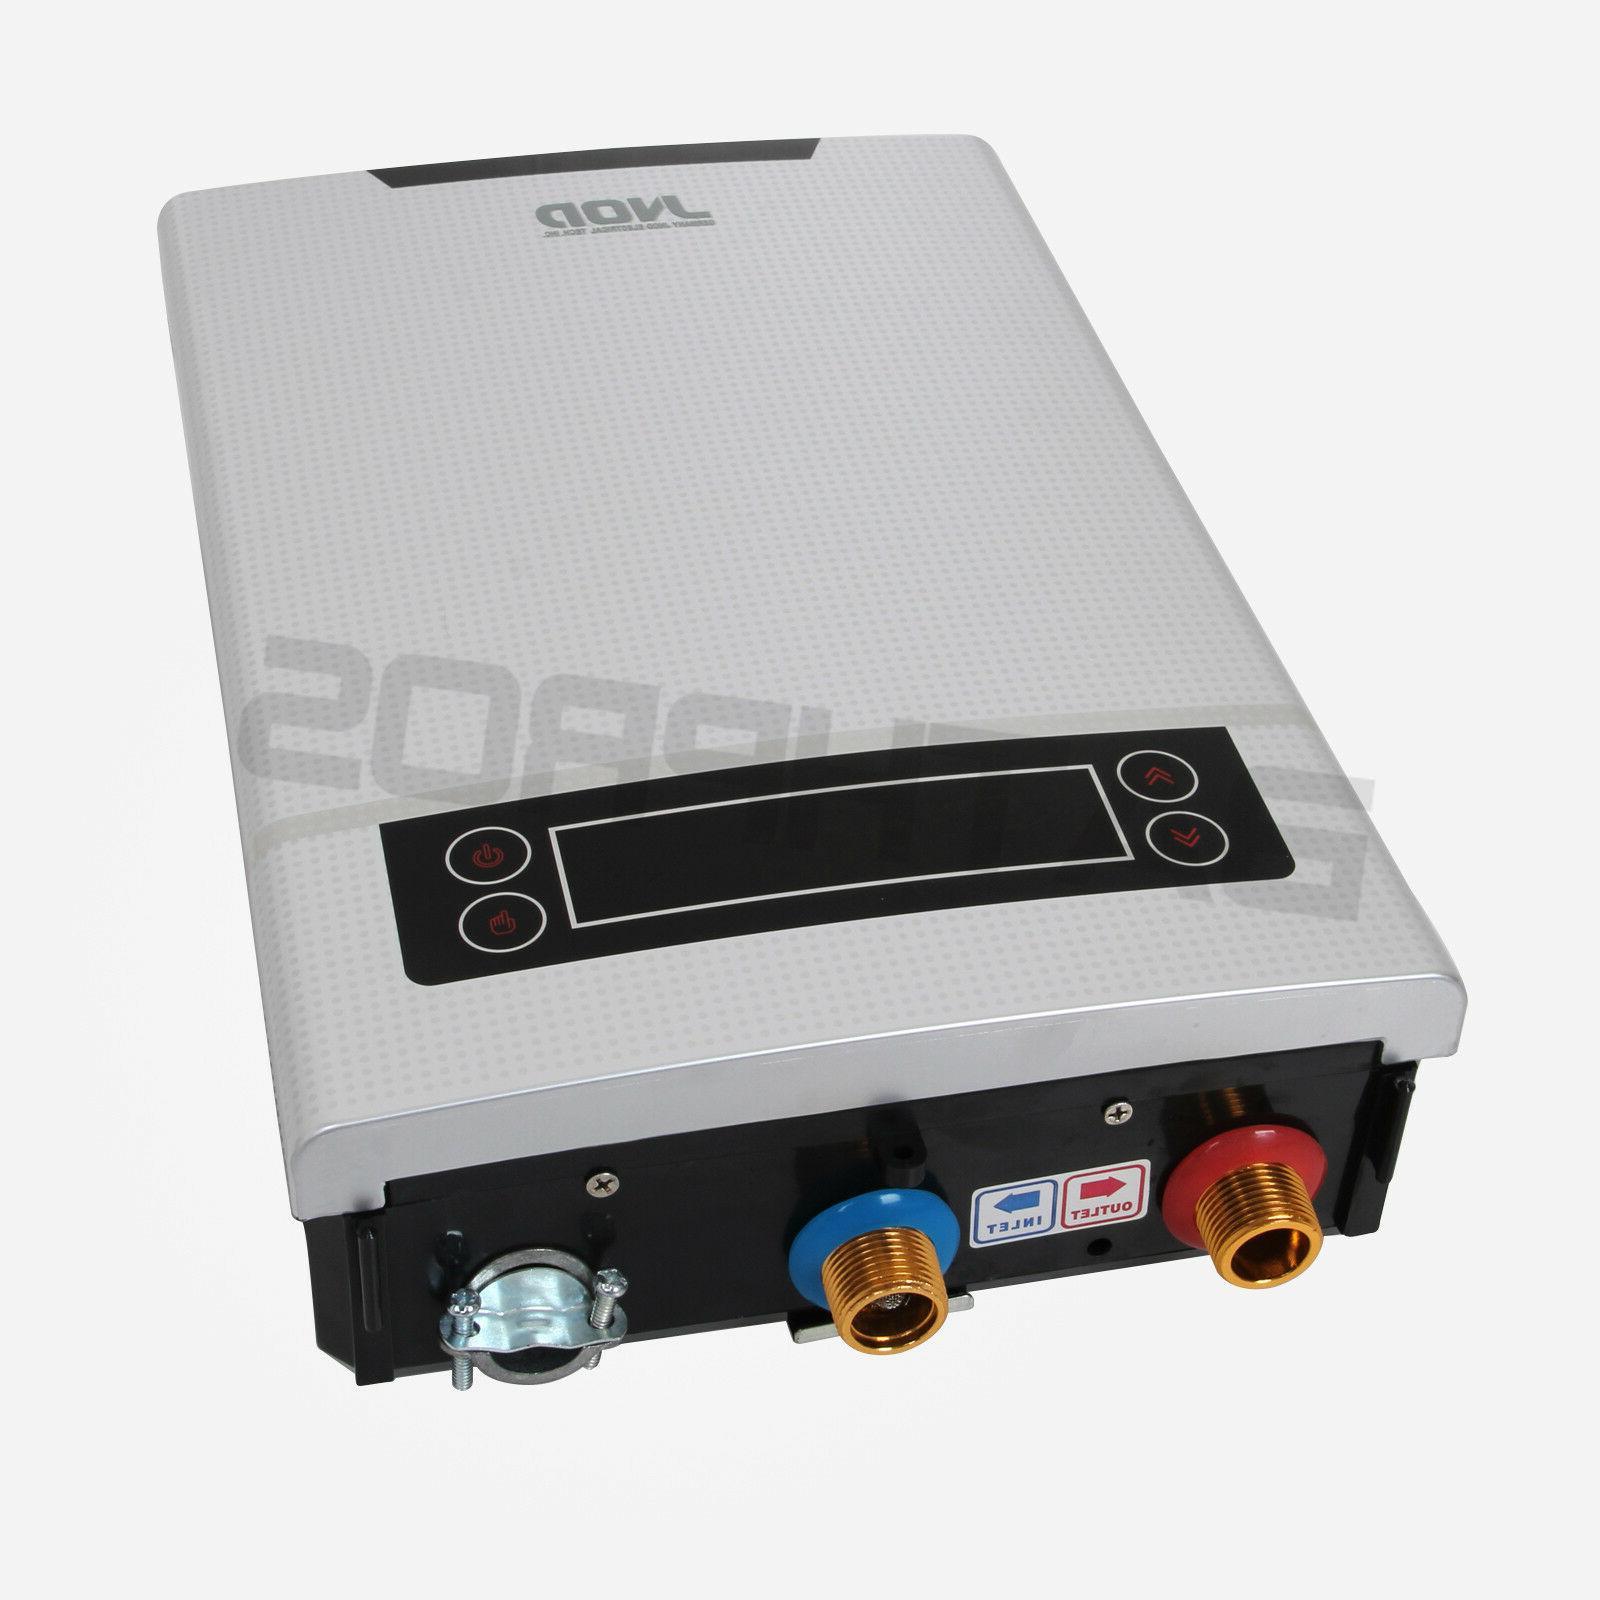 27KW Water Heater Electric Demand Bath 240V